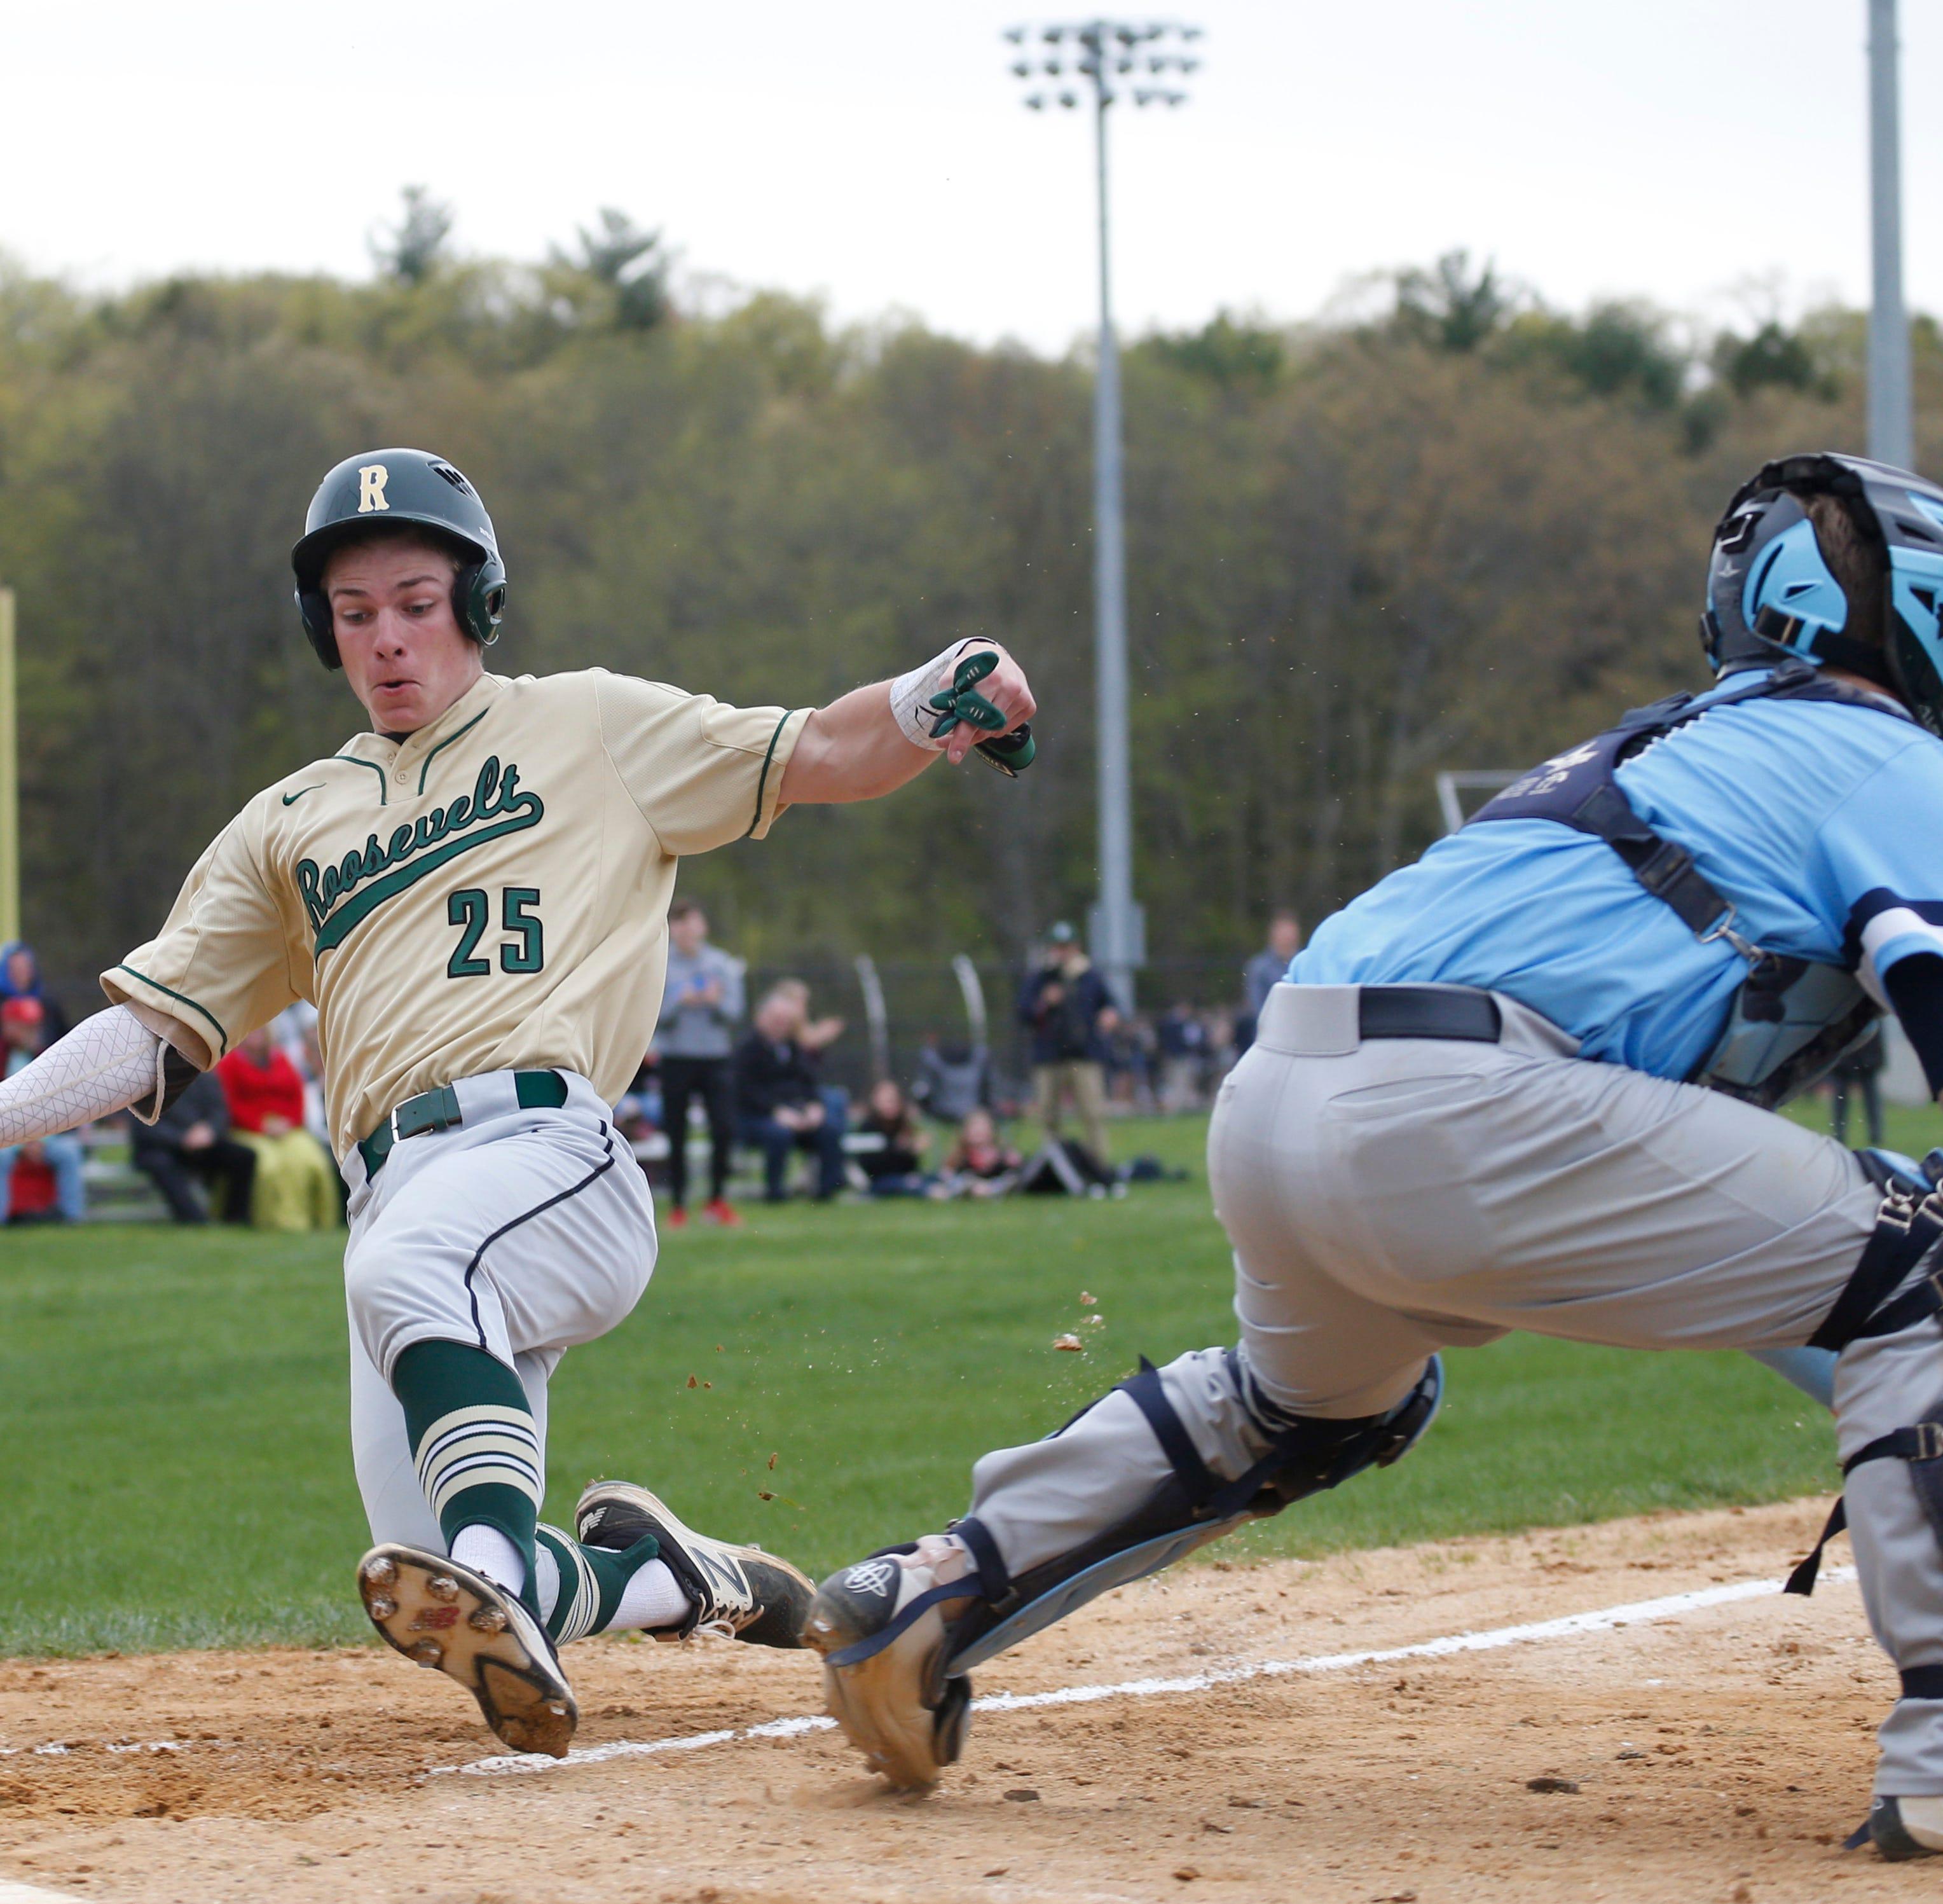 Not-so-secret ingredients: An epic comeback fueled FDR's breakout baseball season